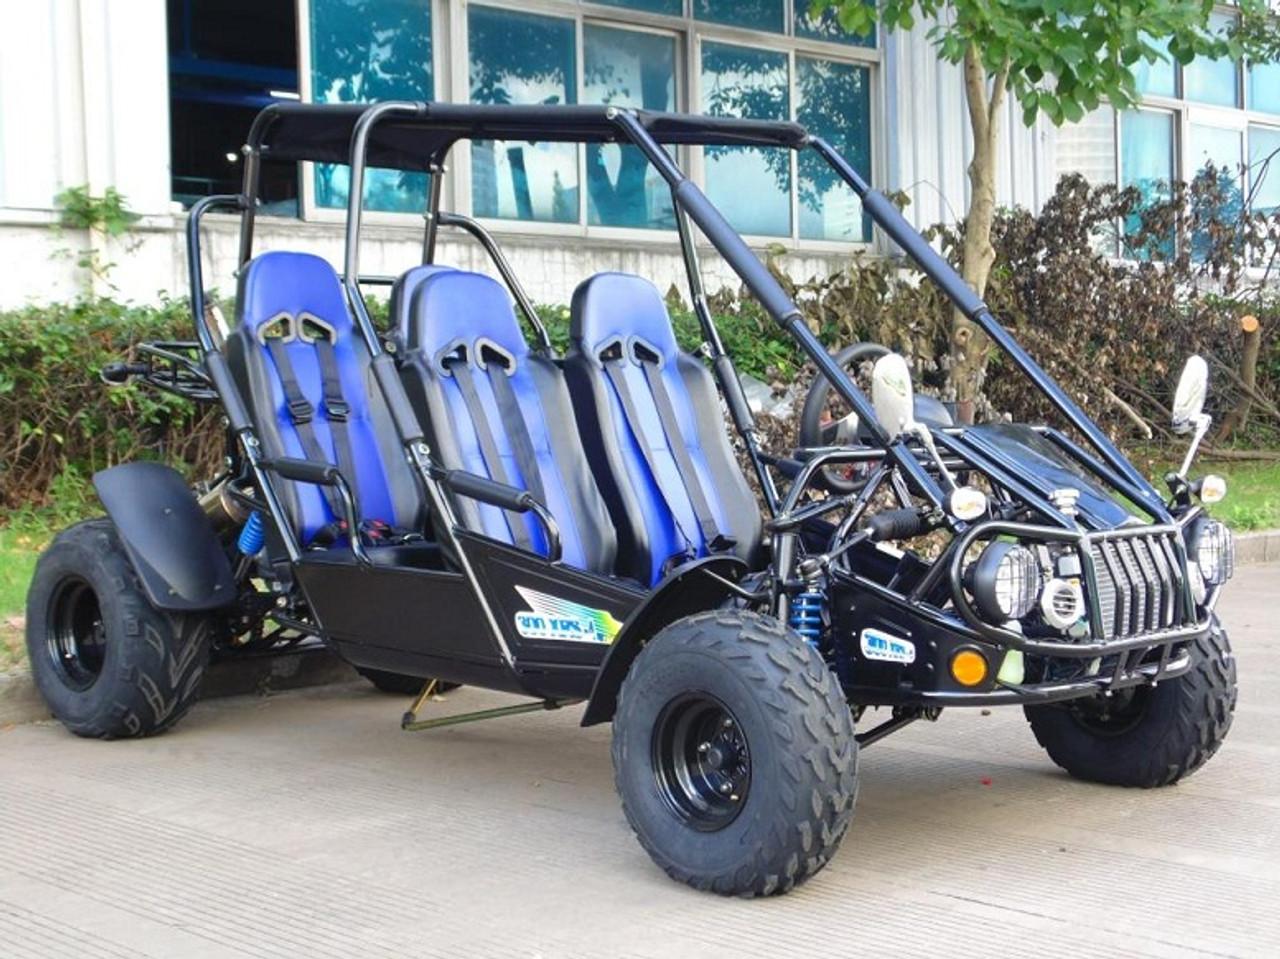 TrailMaster 300 XRS4 Go Kart, CVT Fully Automatic Liquid Cool Engine